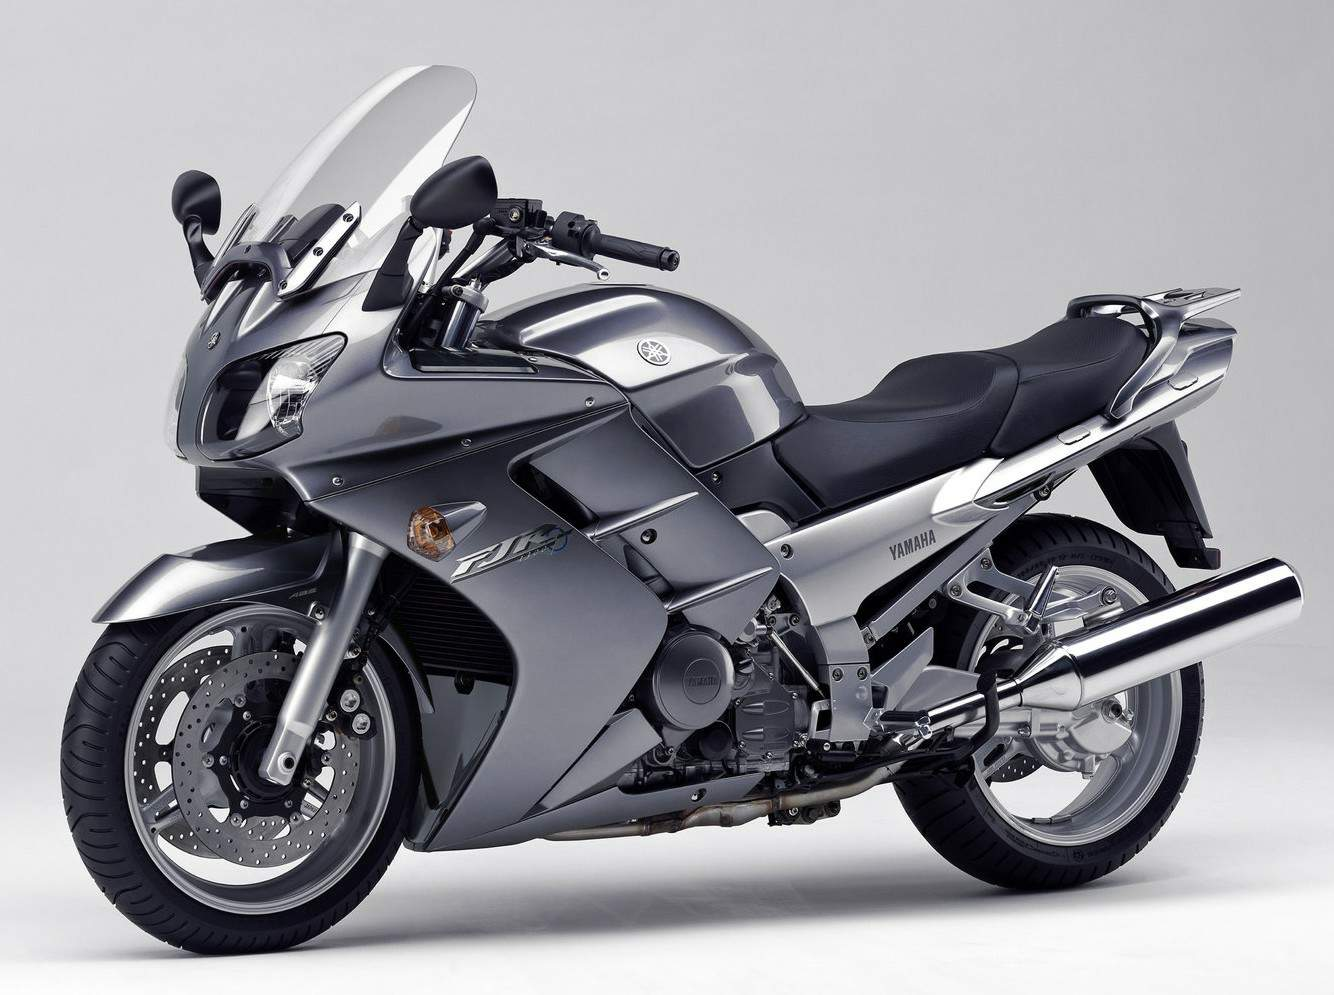 Yamaha Fjr Sport Touring Motorcycle